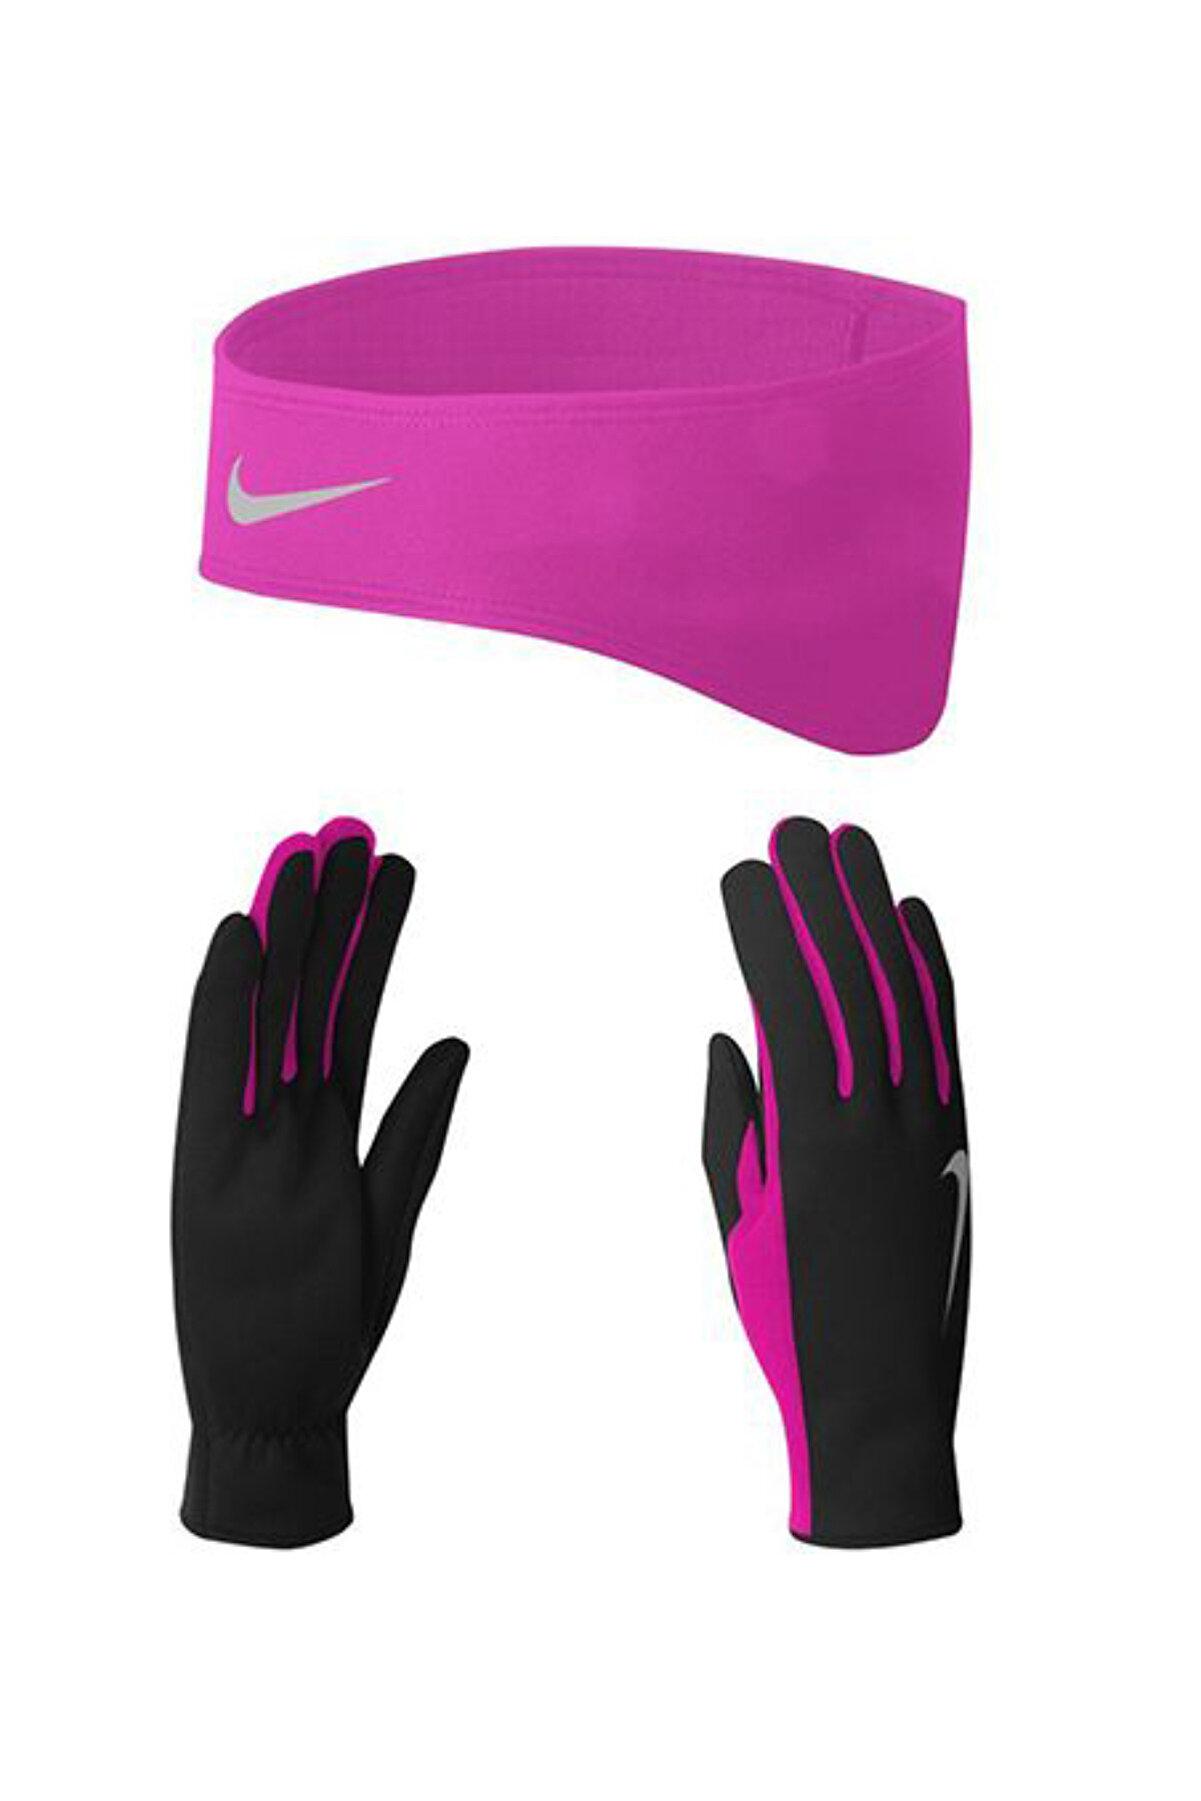 Nike Wmns Termal Koşu Eldiveni Saç Bandı Seti - NRC25-067